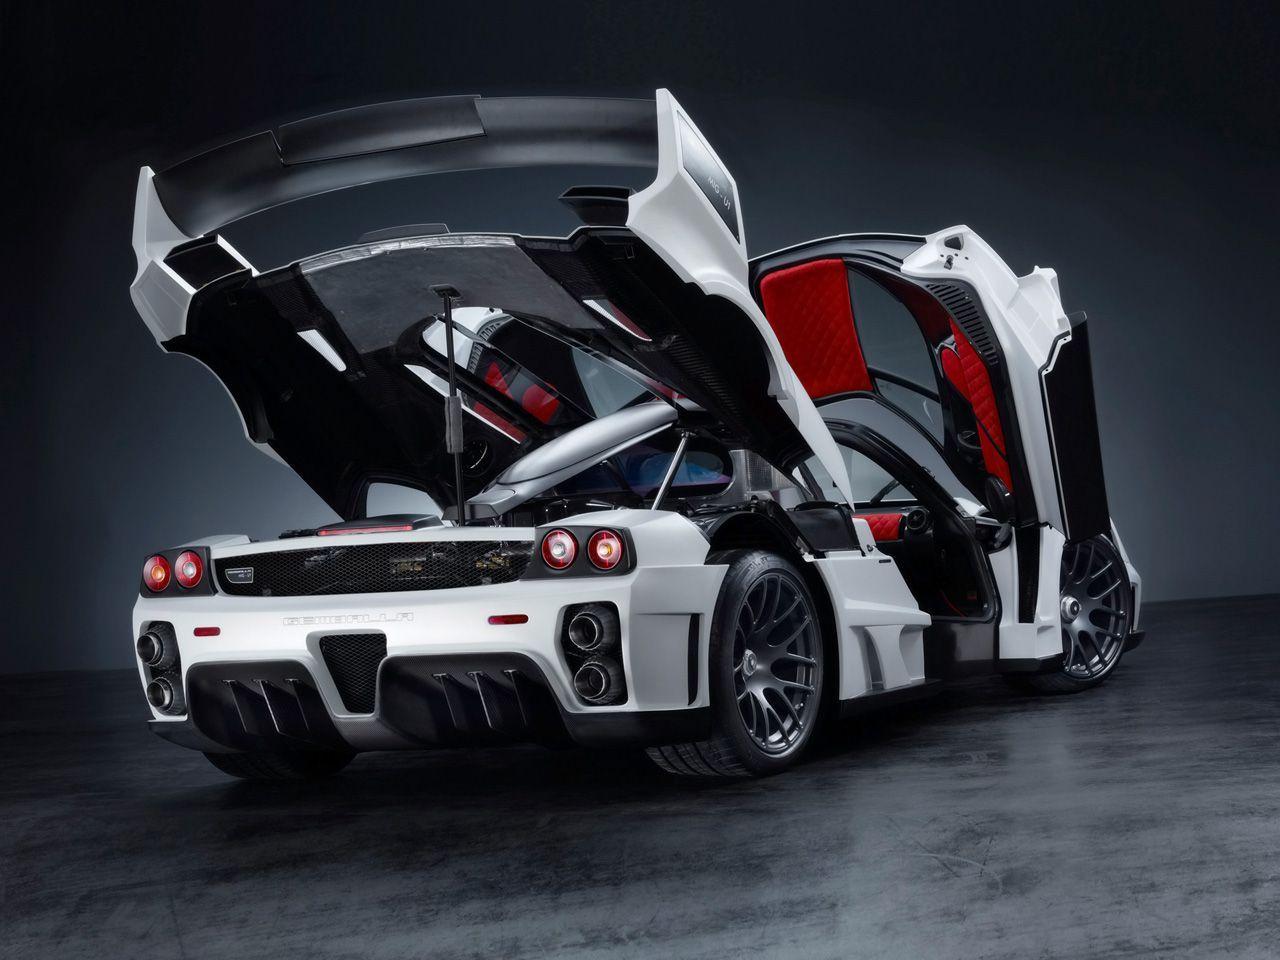 Foto Mobil Ferrari Modifikasi Thefast Theluxurious With Images